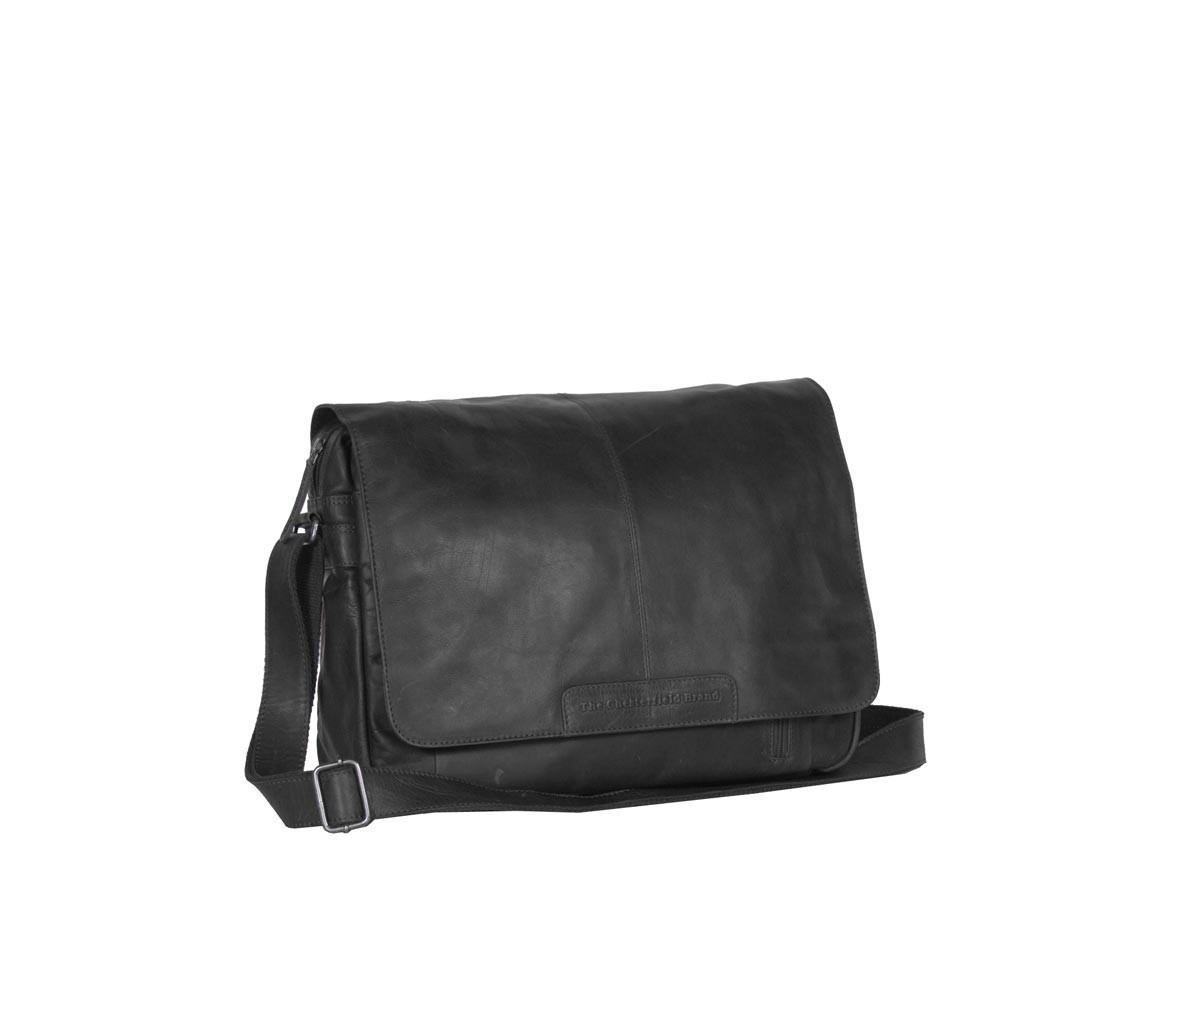 Imagem de Chesterfield Leather Laptop Bag Black Richard